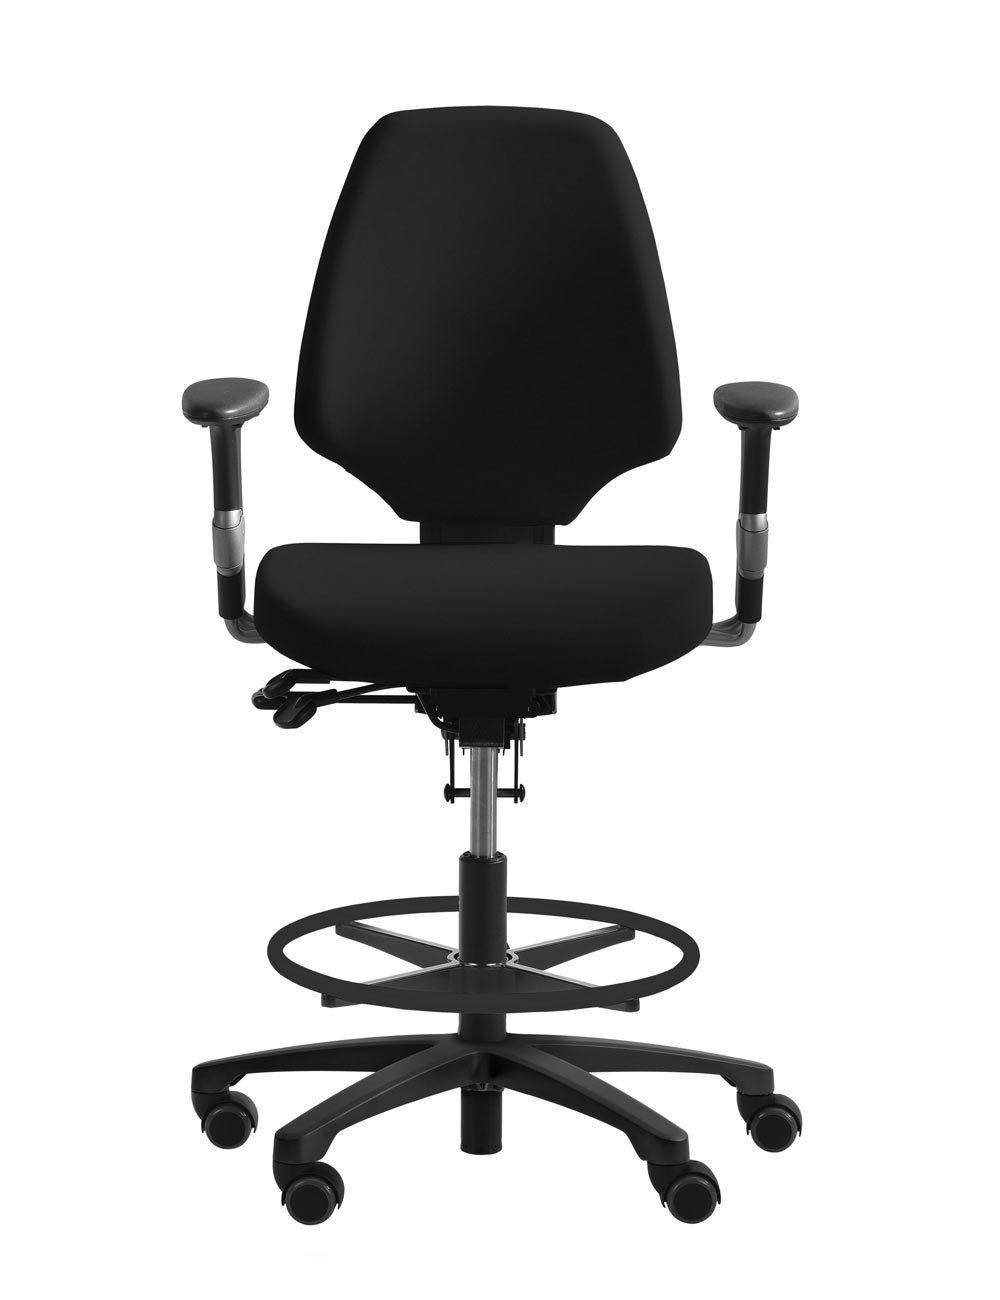 RH Chairs RH Activ 220 Chair £529.20 Inc.